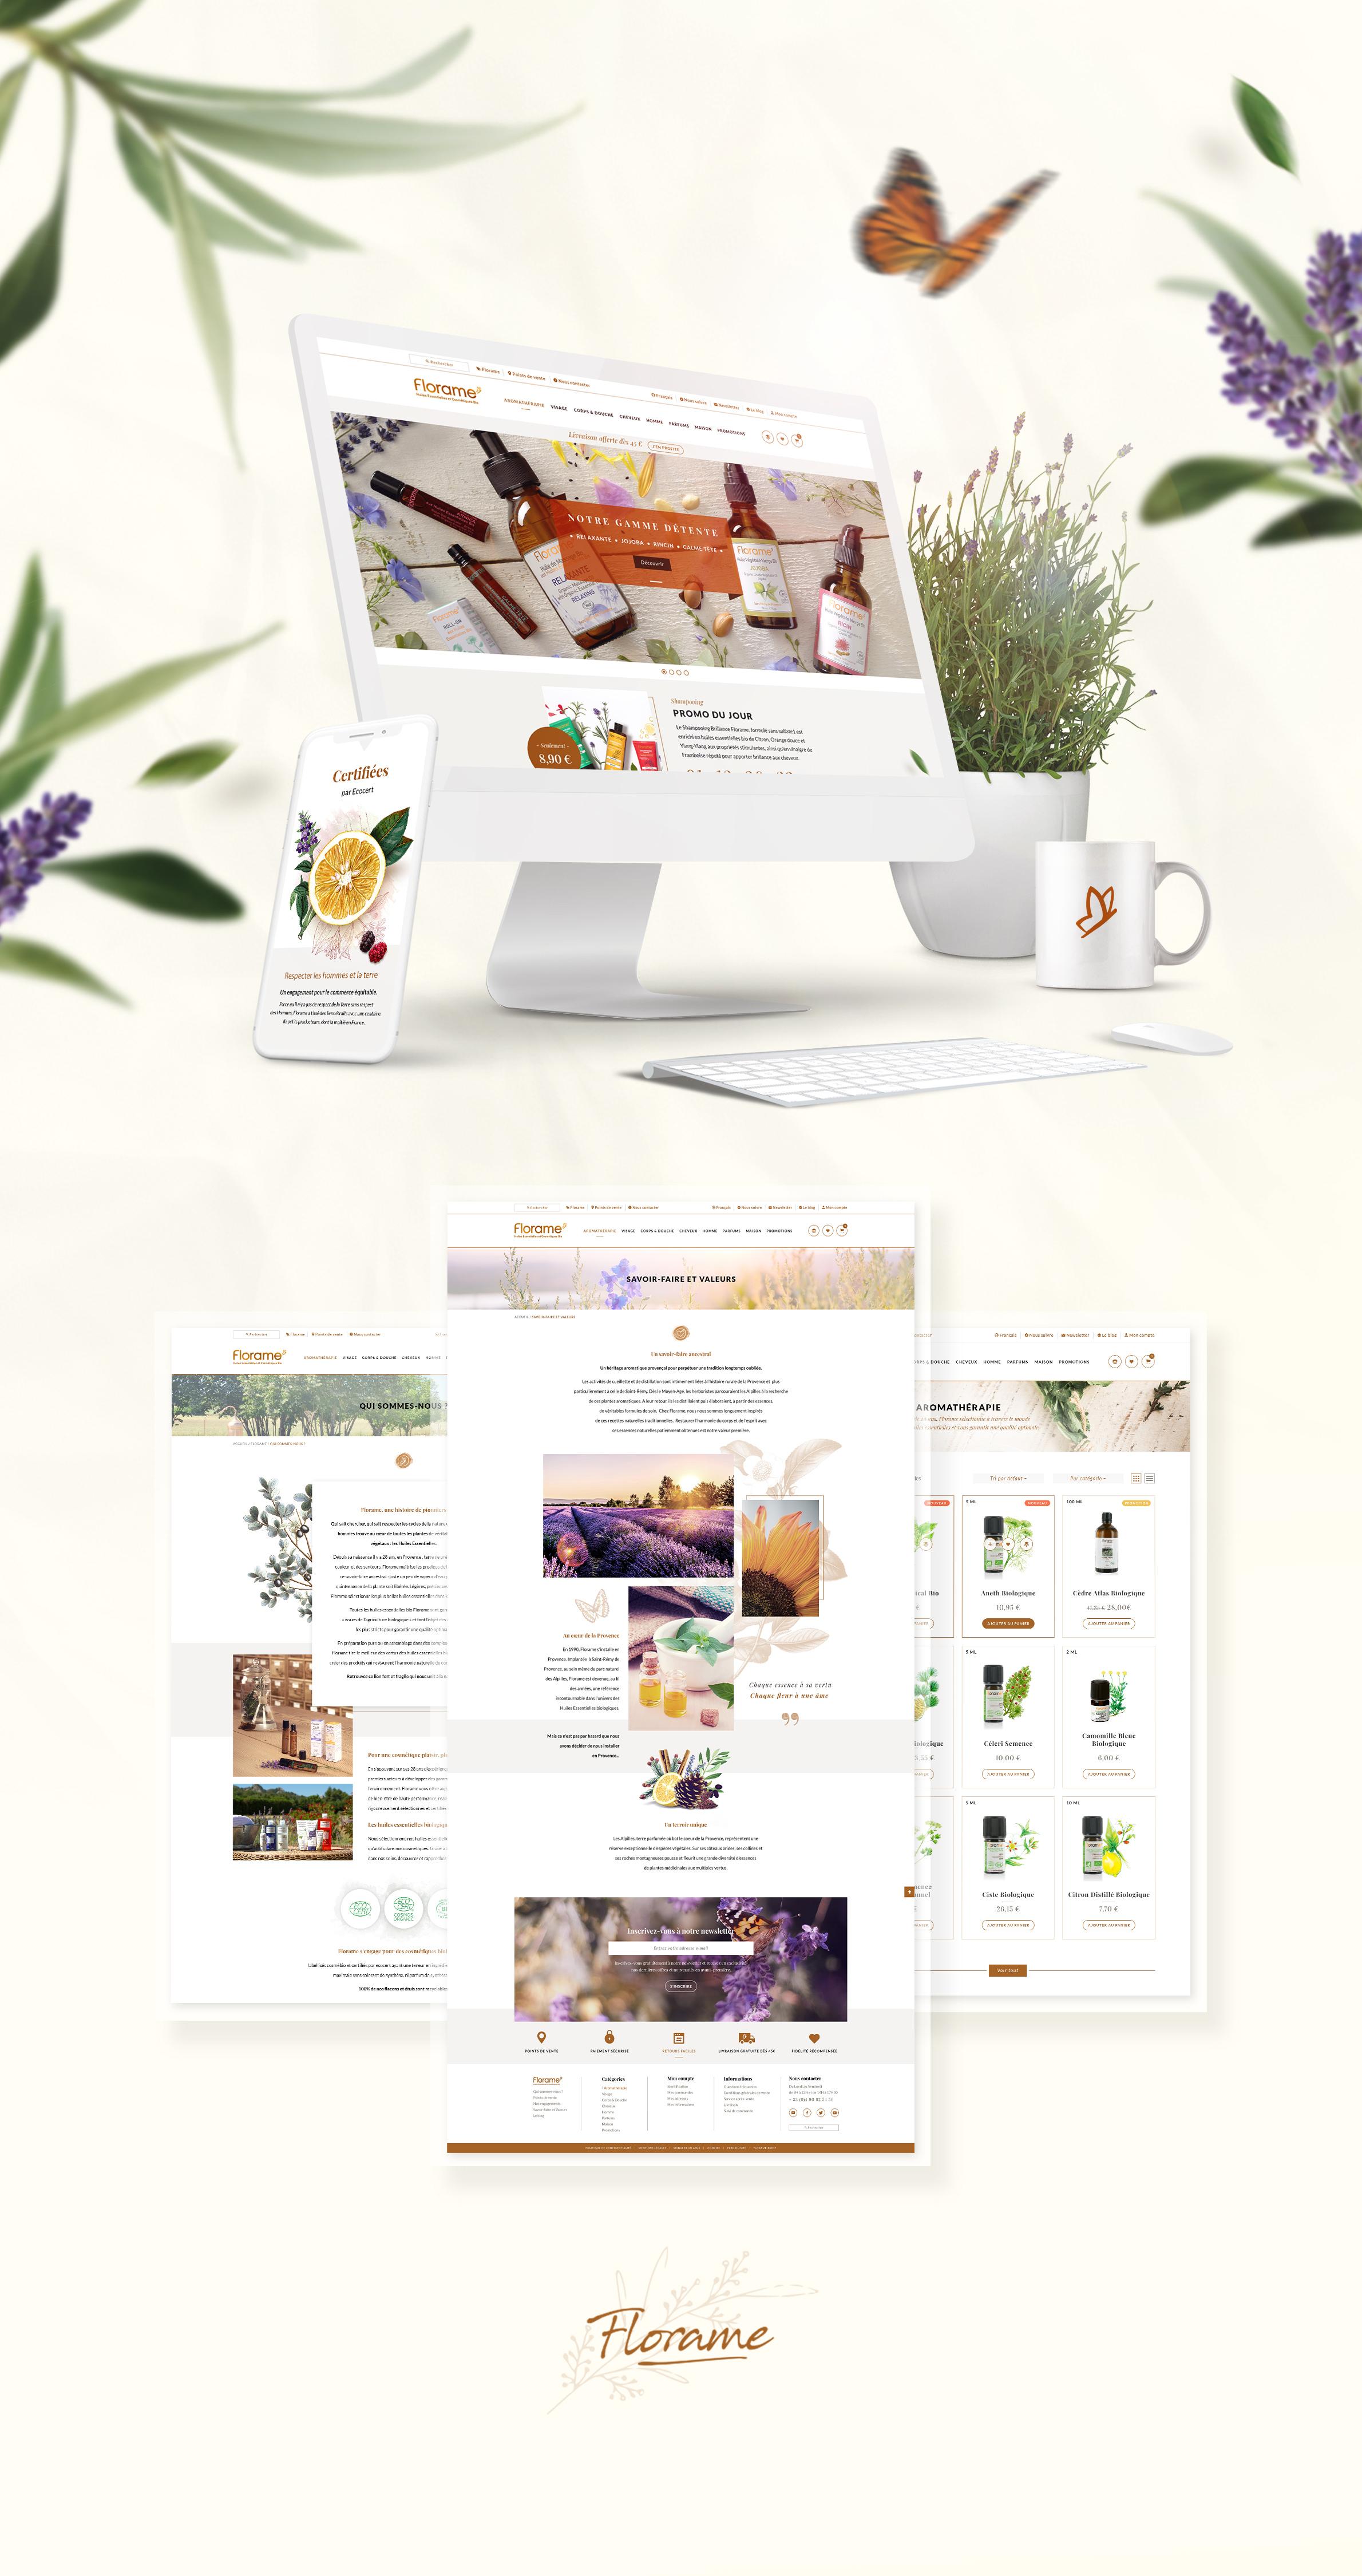 Florame Site Internet Cosmetique Huiles Essentielles